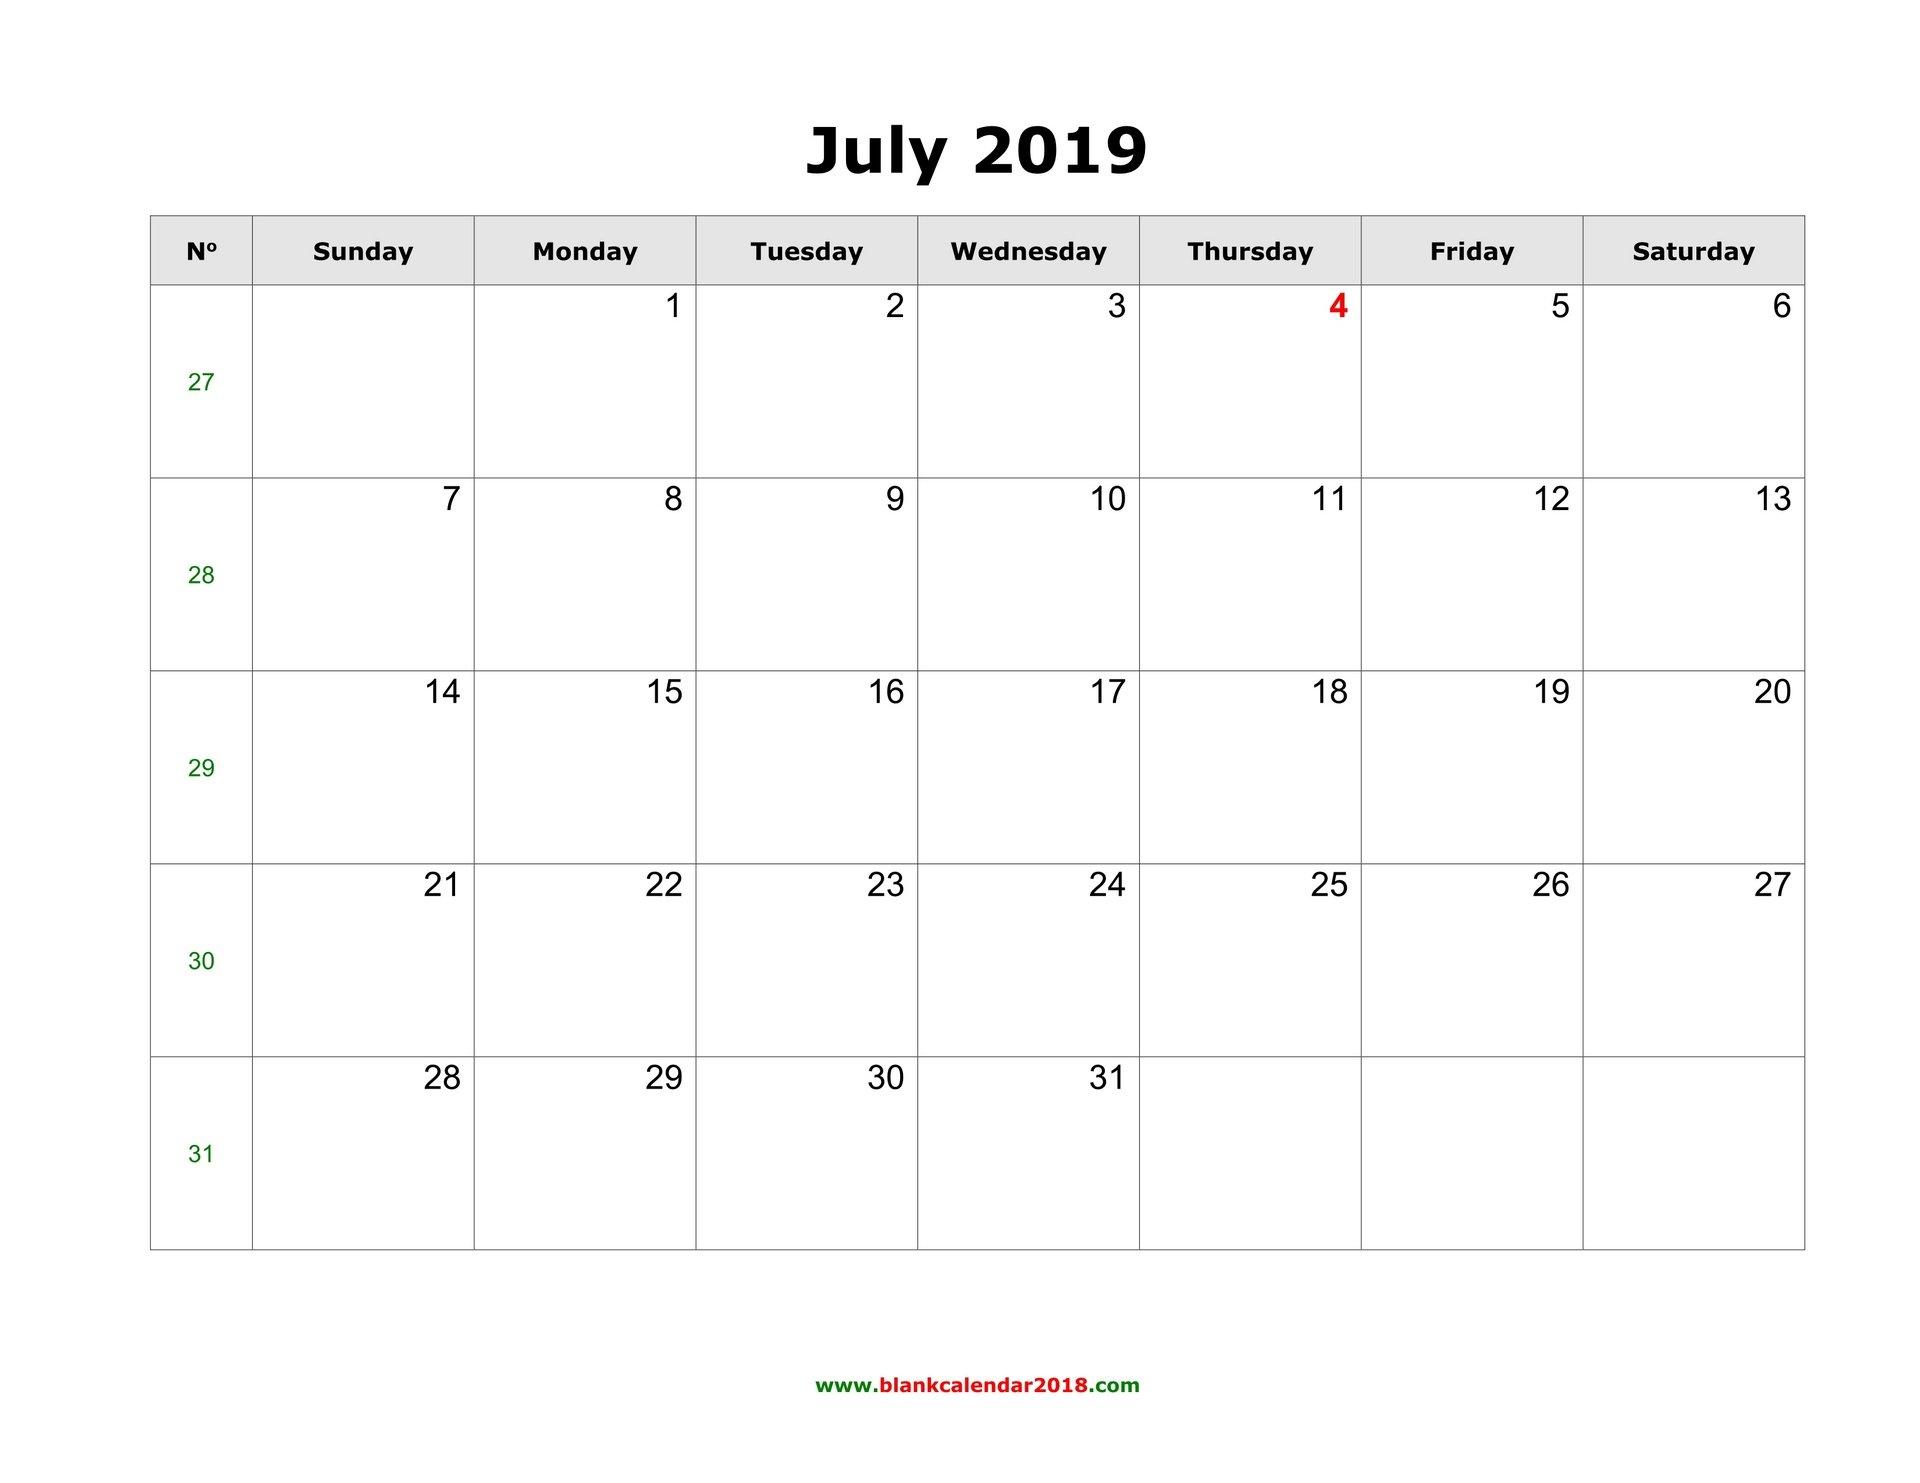 Blank Calendar For July 2019 Calendar 2019 July